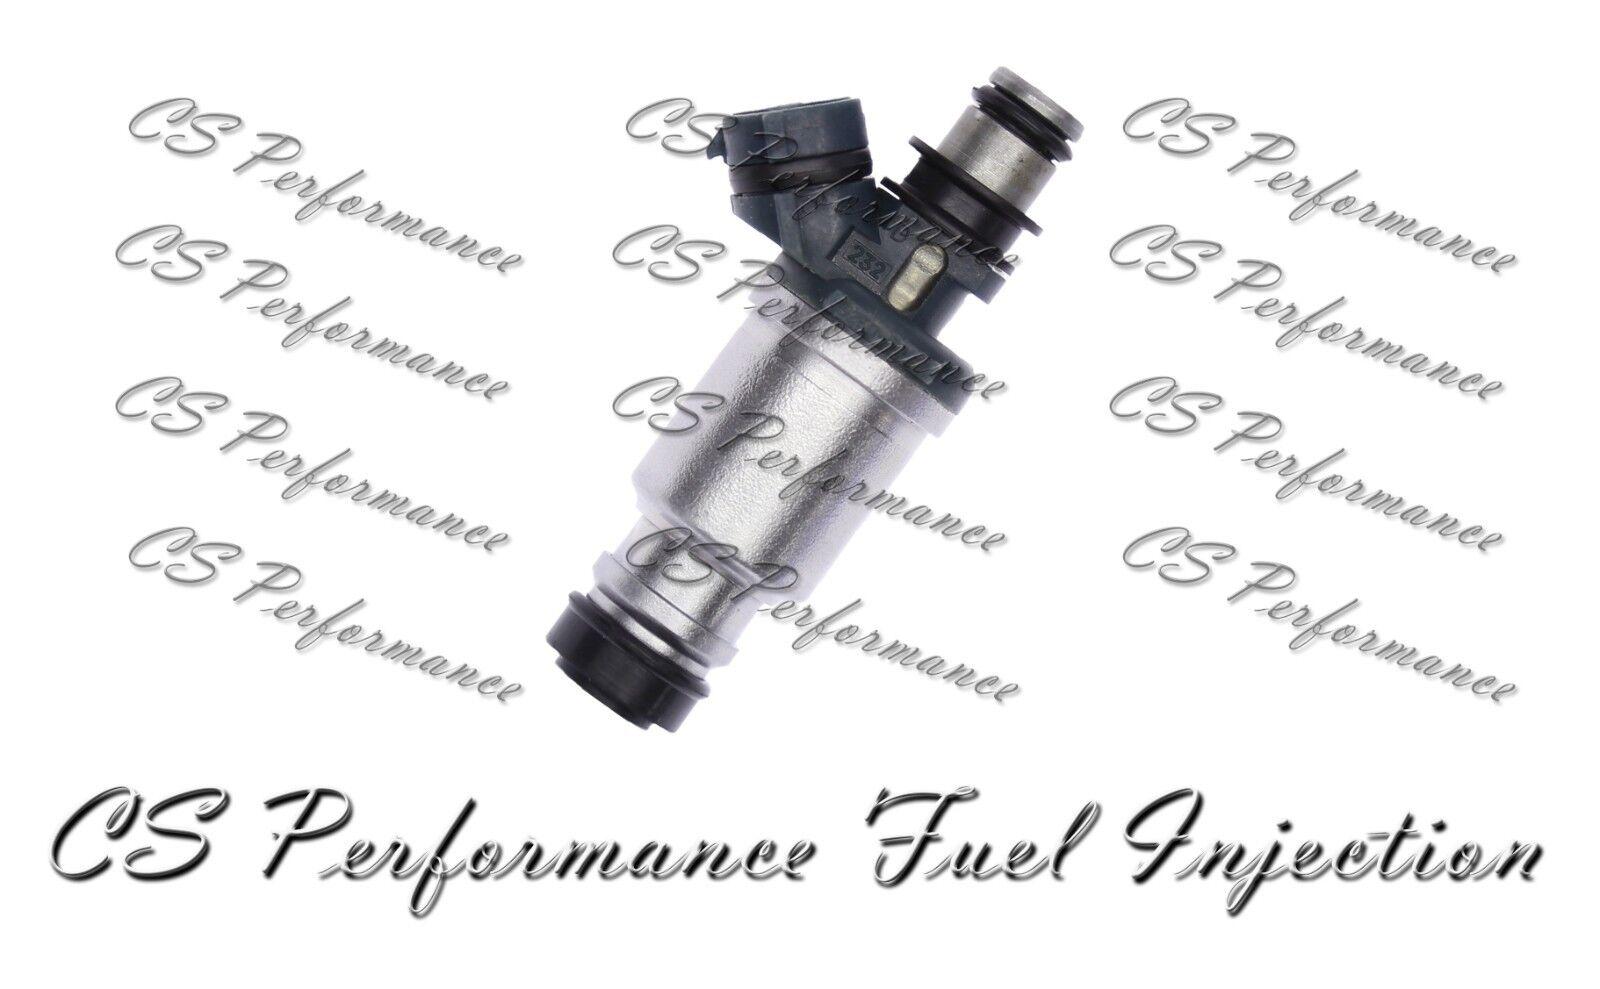 4 OEM Denso Fuel Injectors Set 23250-76010 Rebuilt by Master ASE Mechanic USA